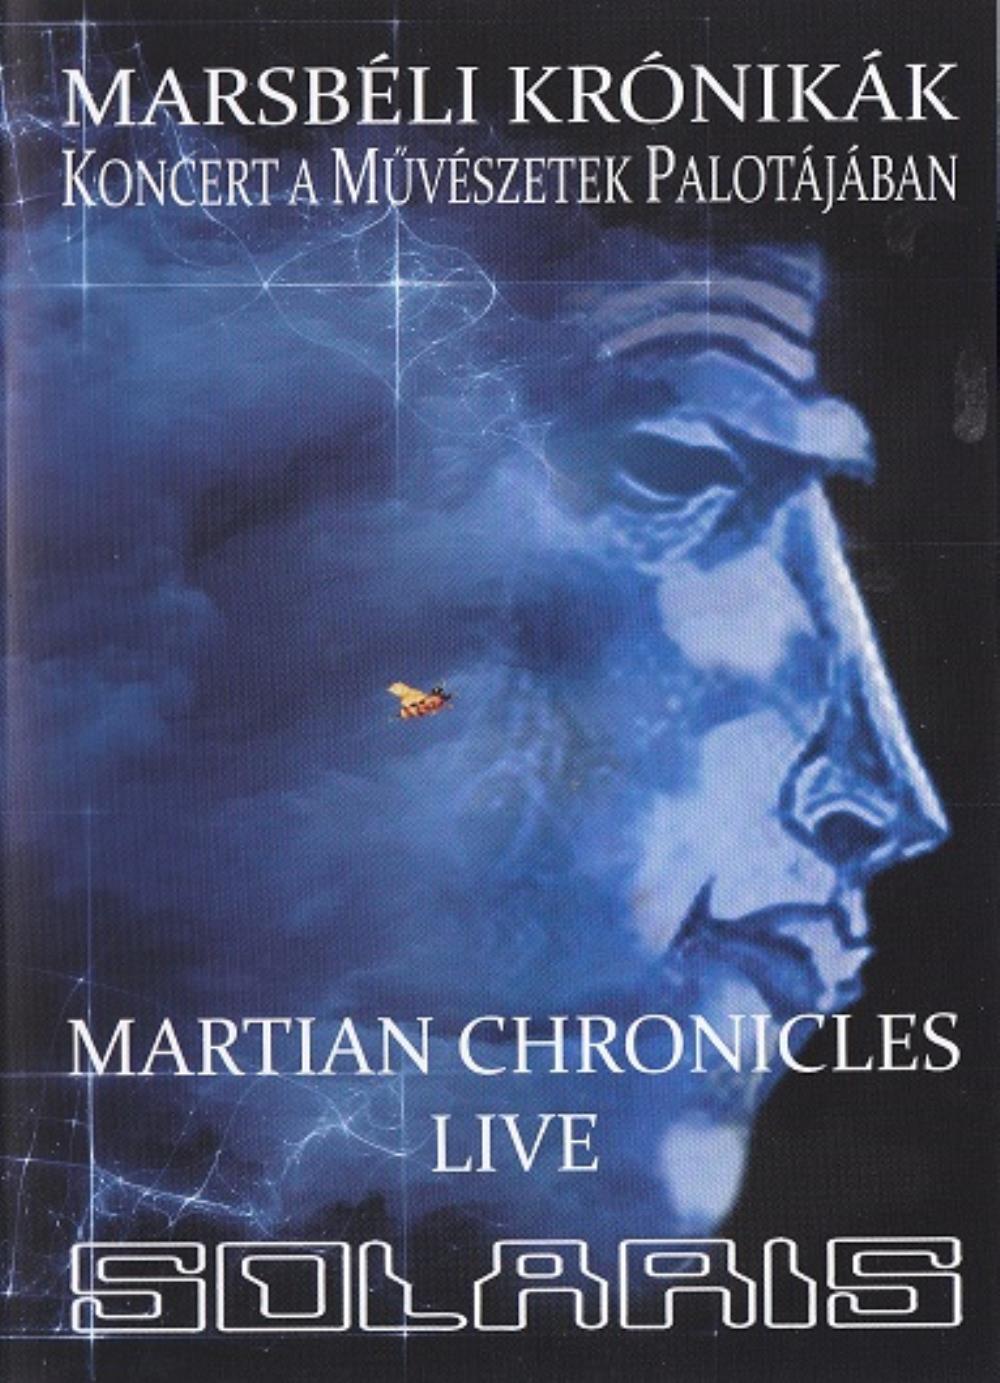 Martian Chronicles Live by SOLARIS album cover